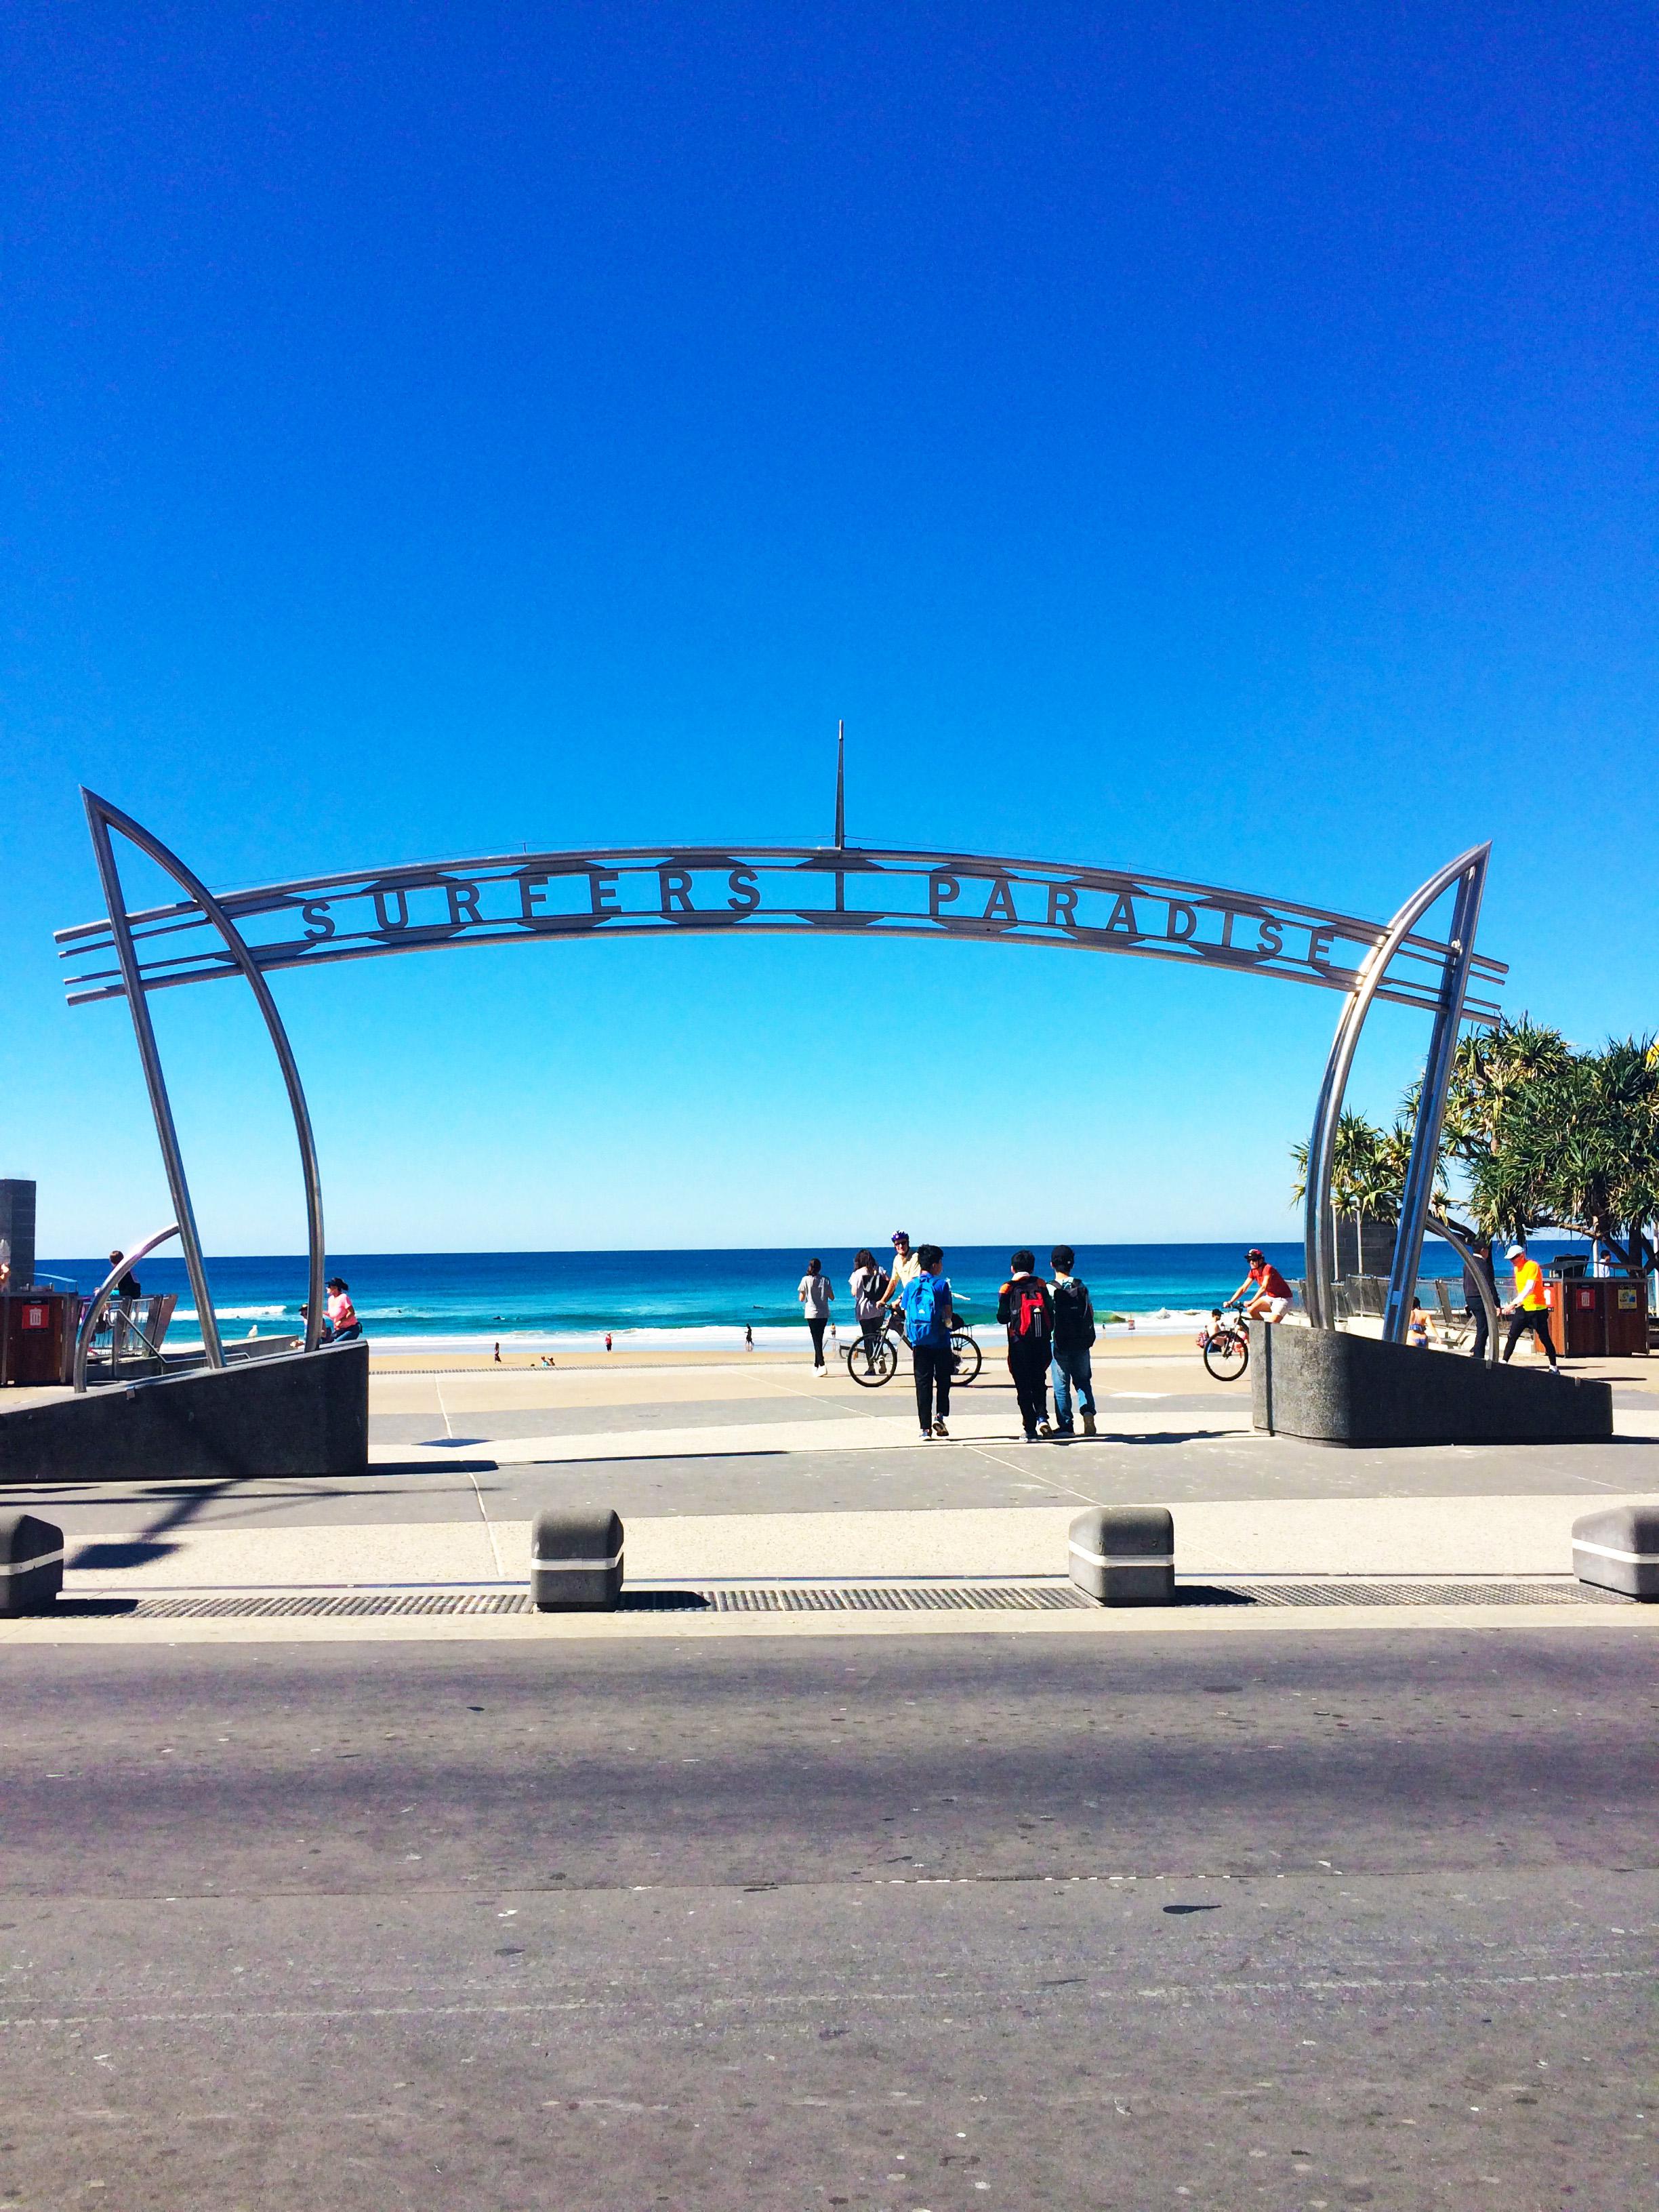 3-Gold Coast_surfers paradise.jpg